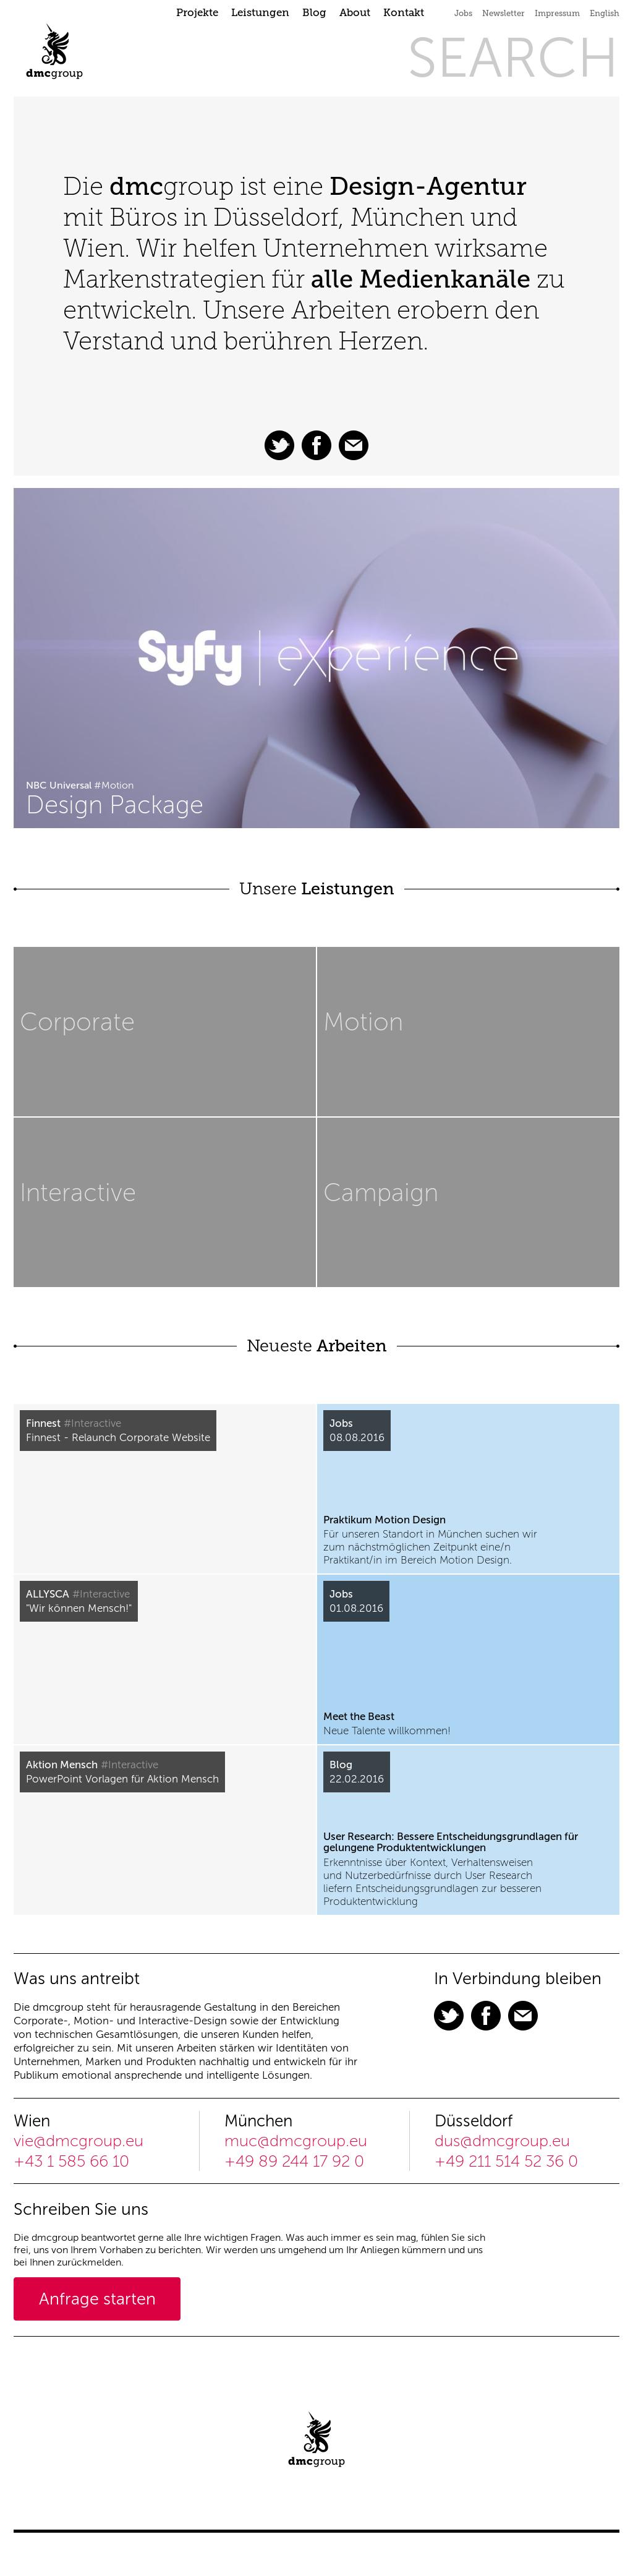 Allysca dmc competitors, revenue and employees - owler company profile